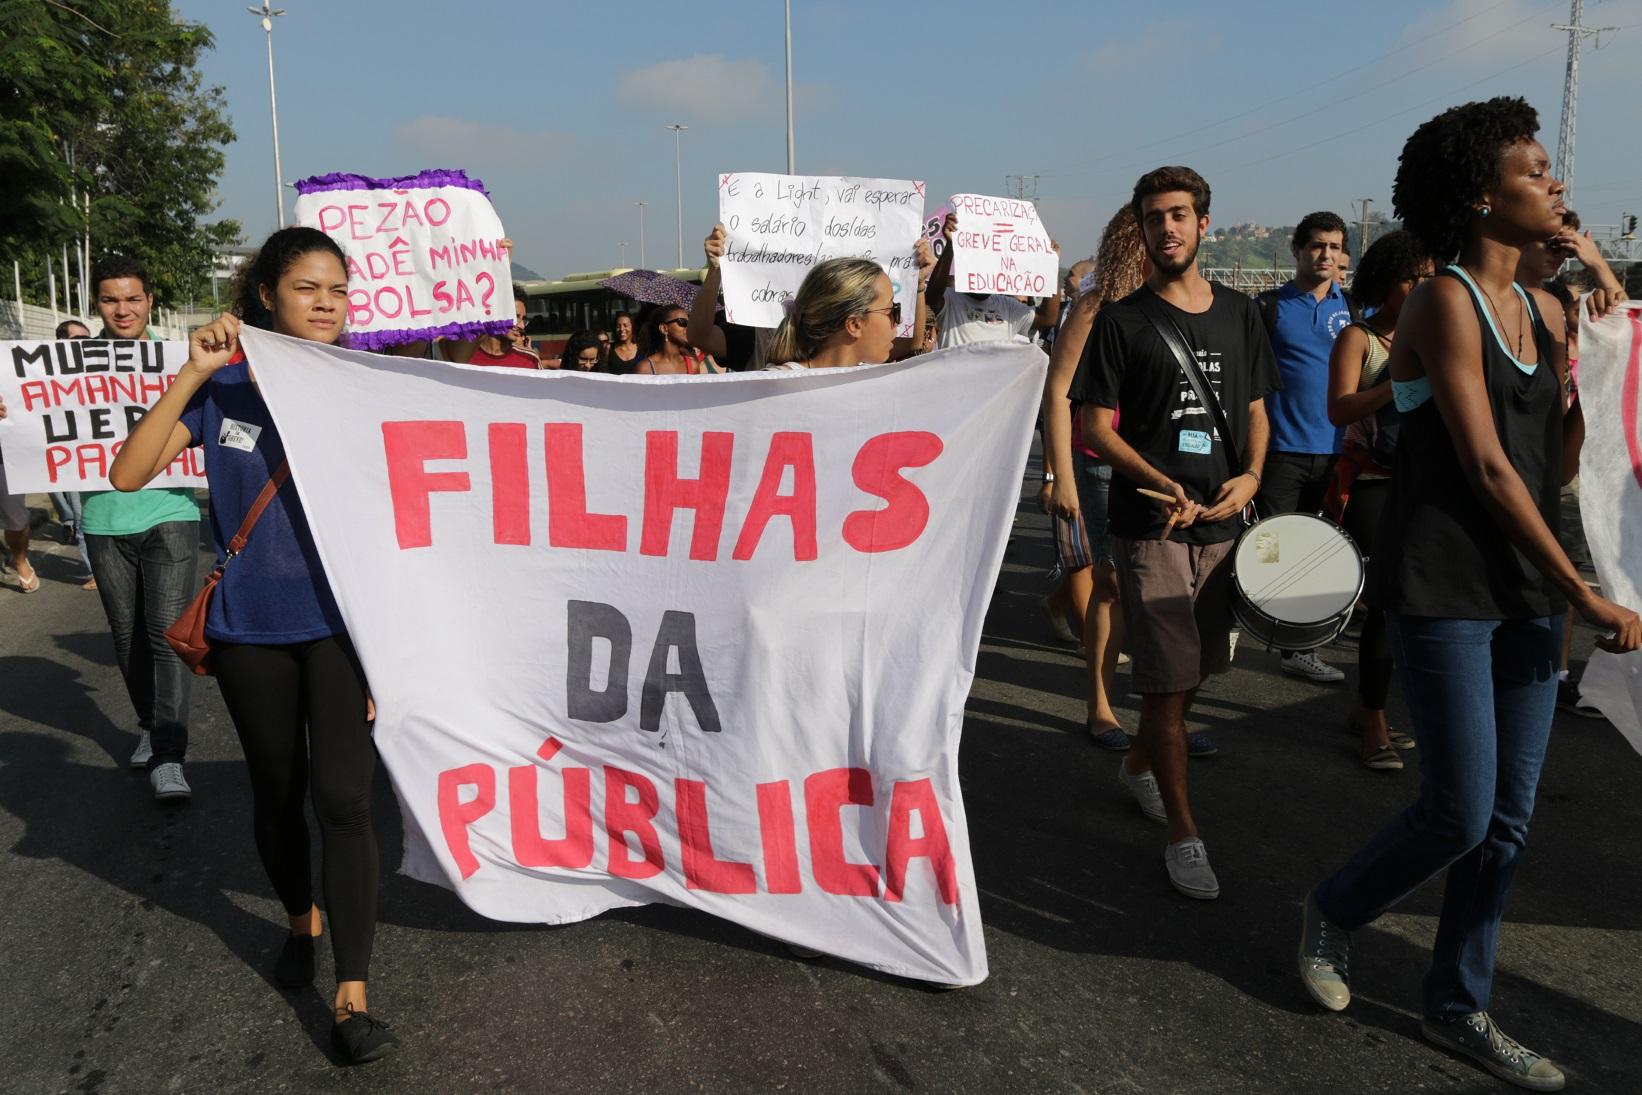 Estudantes de universidades públicas protestam contra os cortes de verba. Foto Alessandro Pereira da Silva/Citizenside